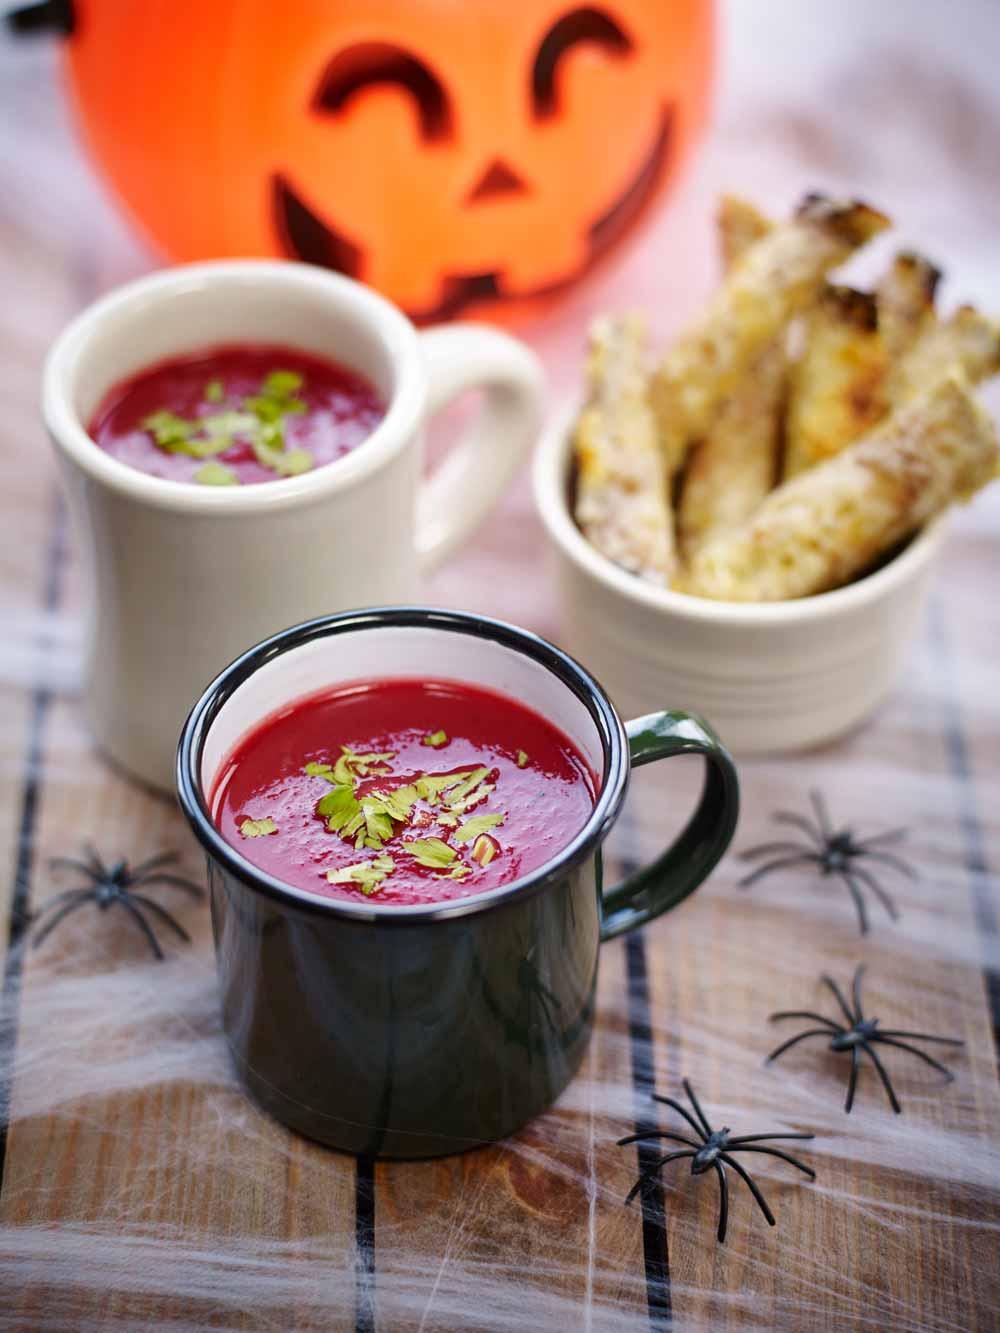 Beetroot & pumpkin soup